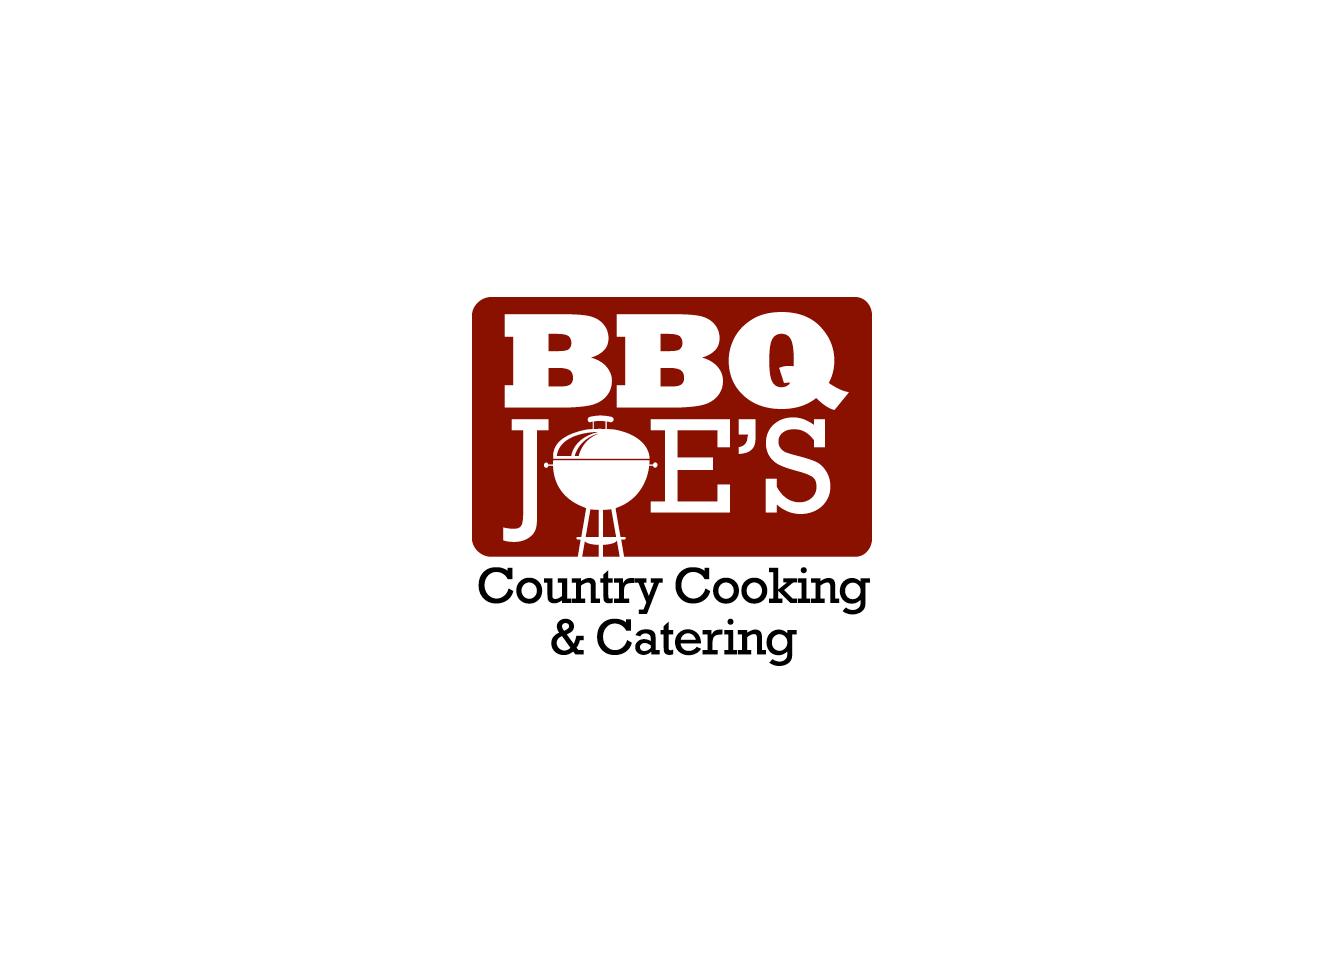 BBQ Joe's